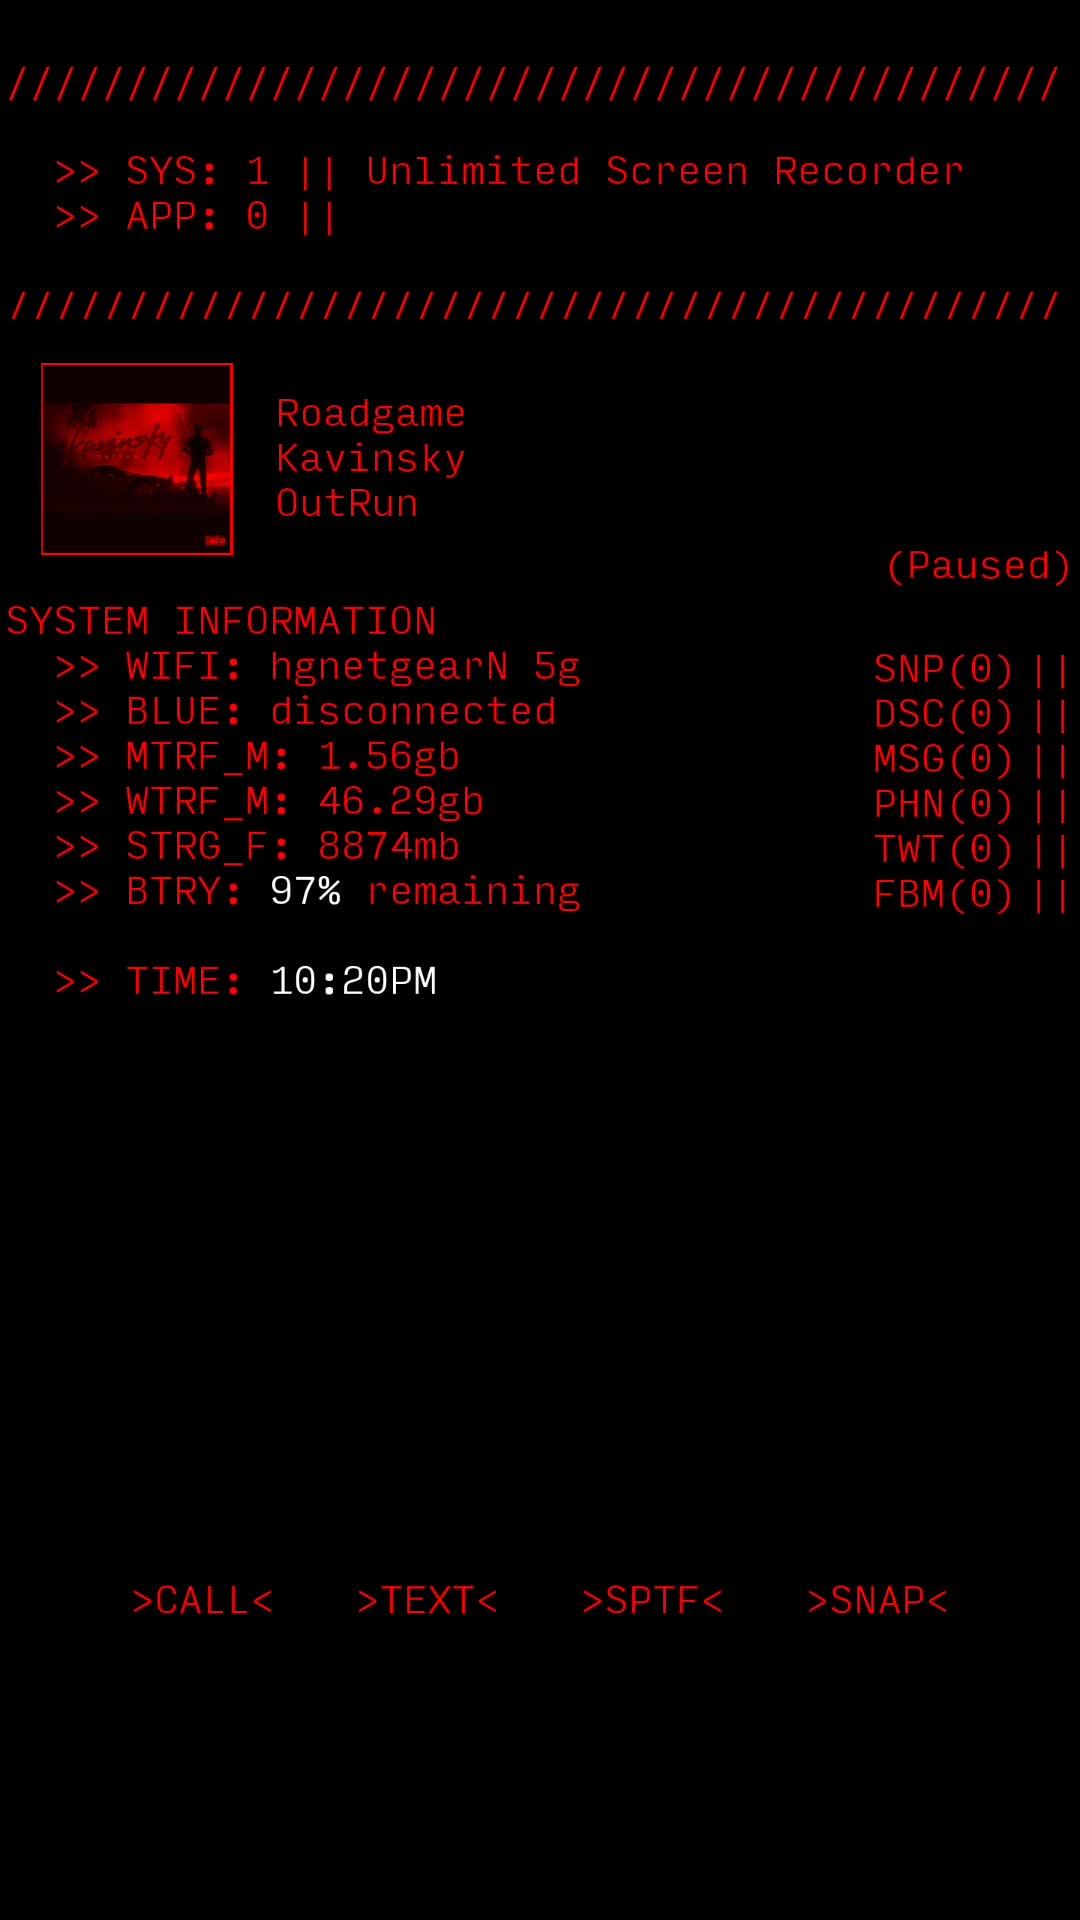 KLWP, KWGT, Kustom, KWGT/KLWP ASCII Theme Demo GIFs